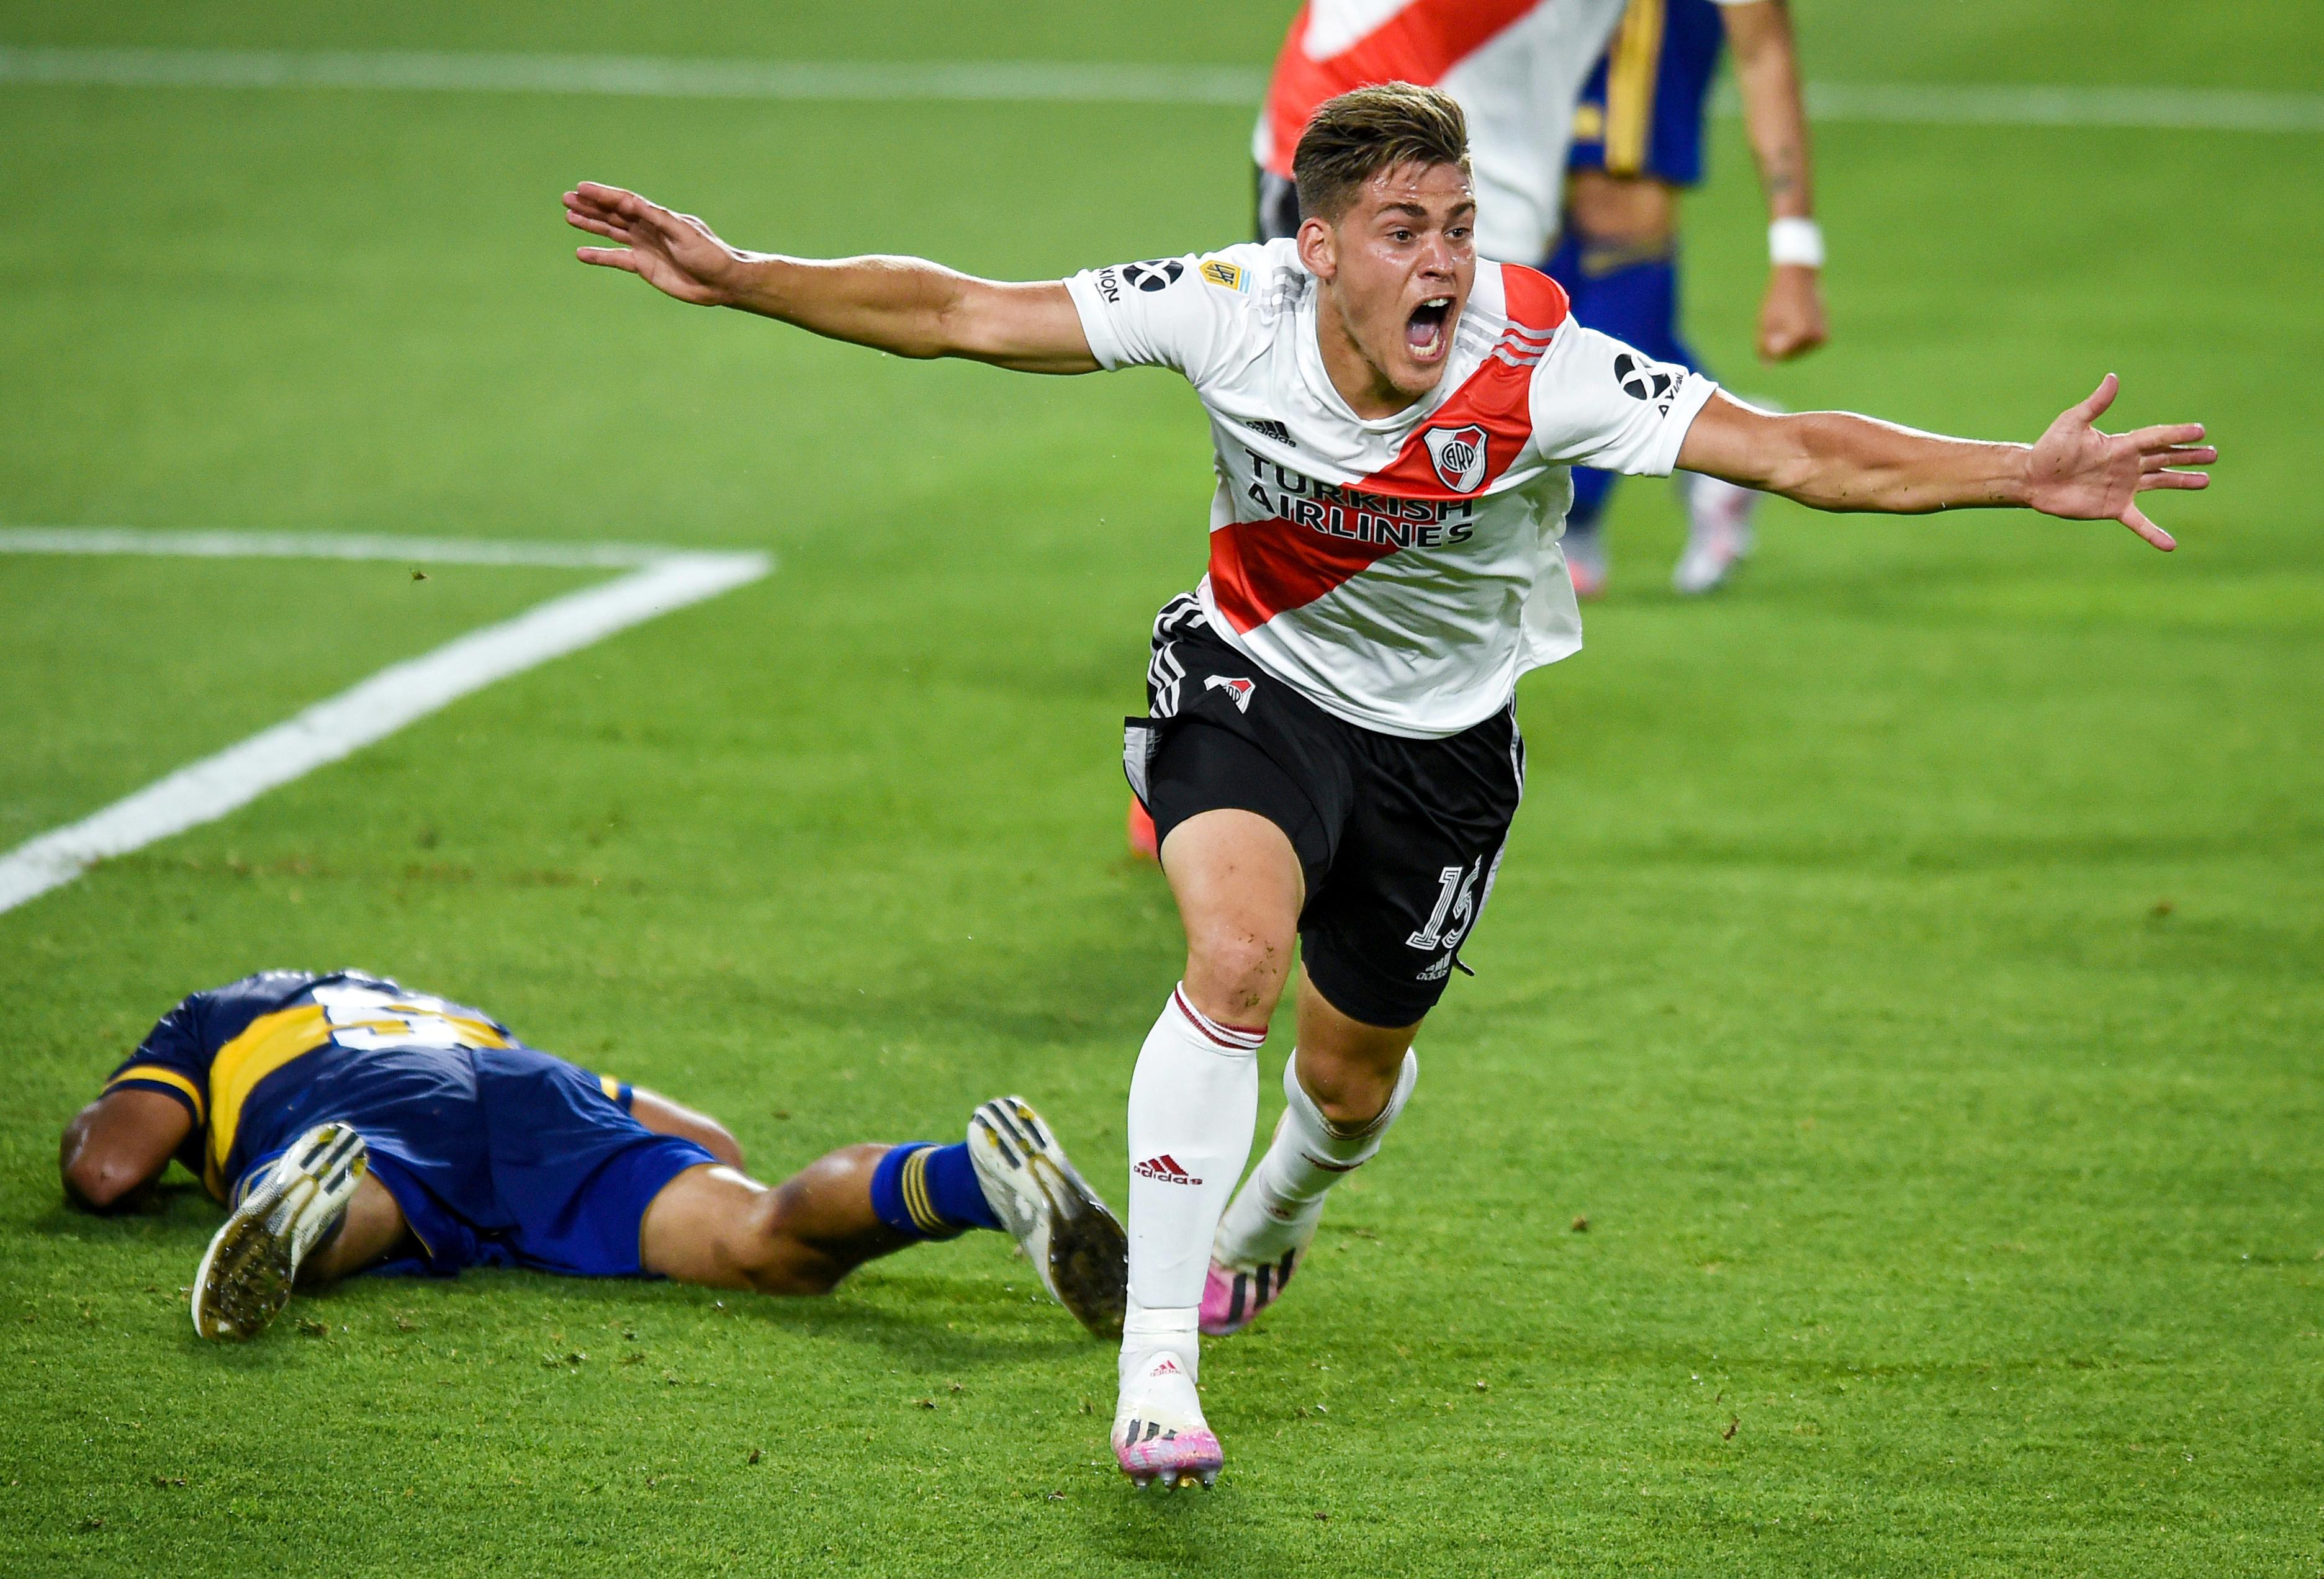 El festejo alojado de Federico Girotti en el momento del 1-1 (REUTERS/Marcelo Endelli)